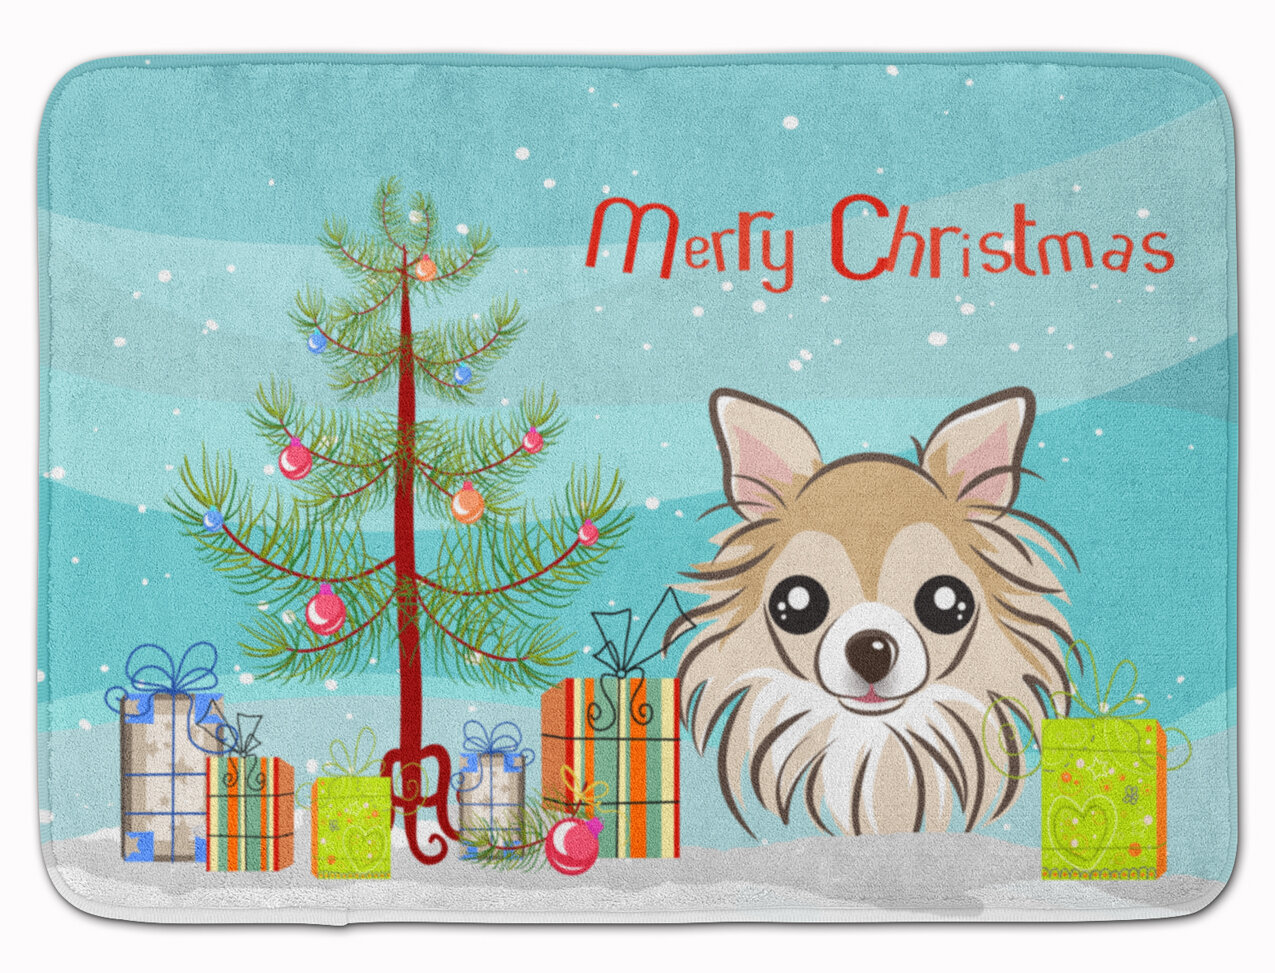 The Holiday Aisle Christmas Tree And Chihuahua Rectangle Microfiber Non Slip Bath Rug Wayfair